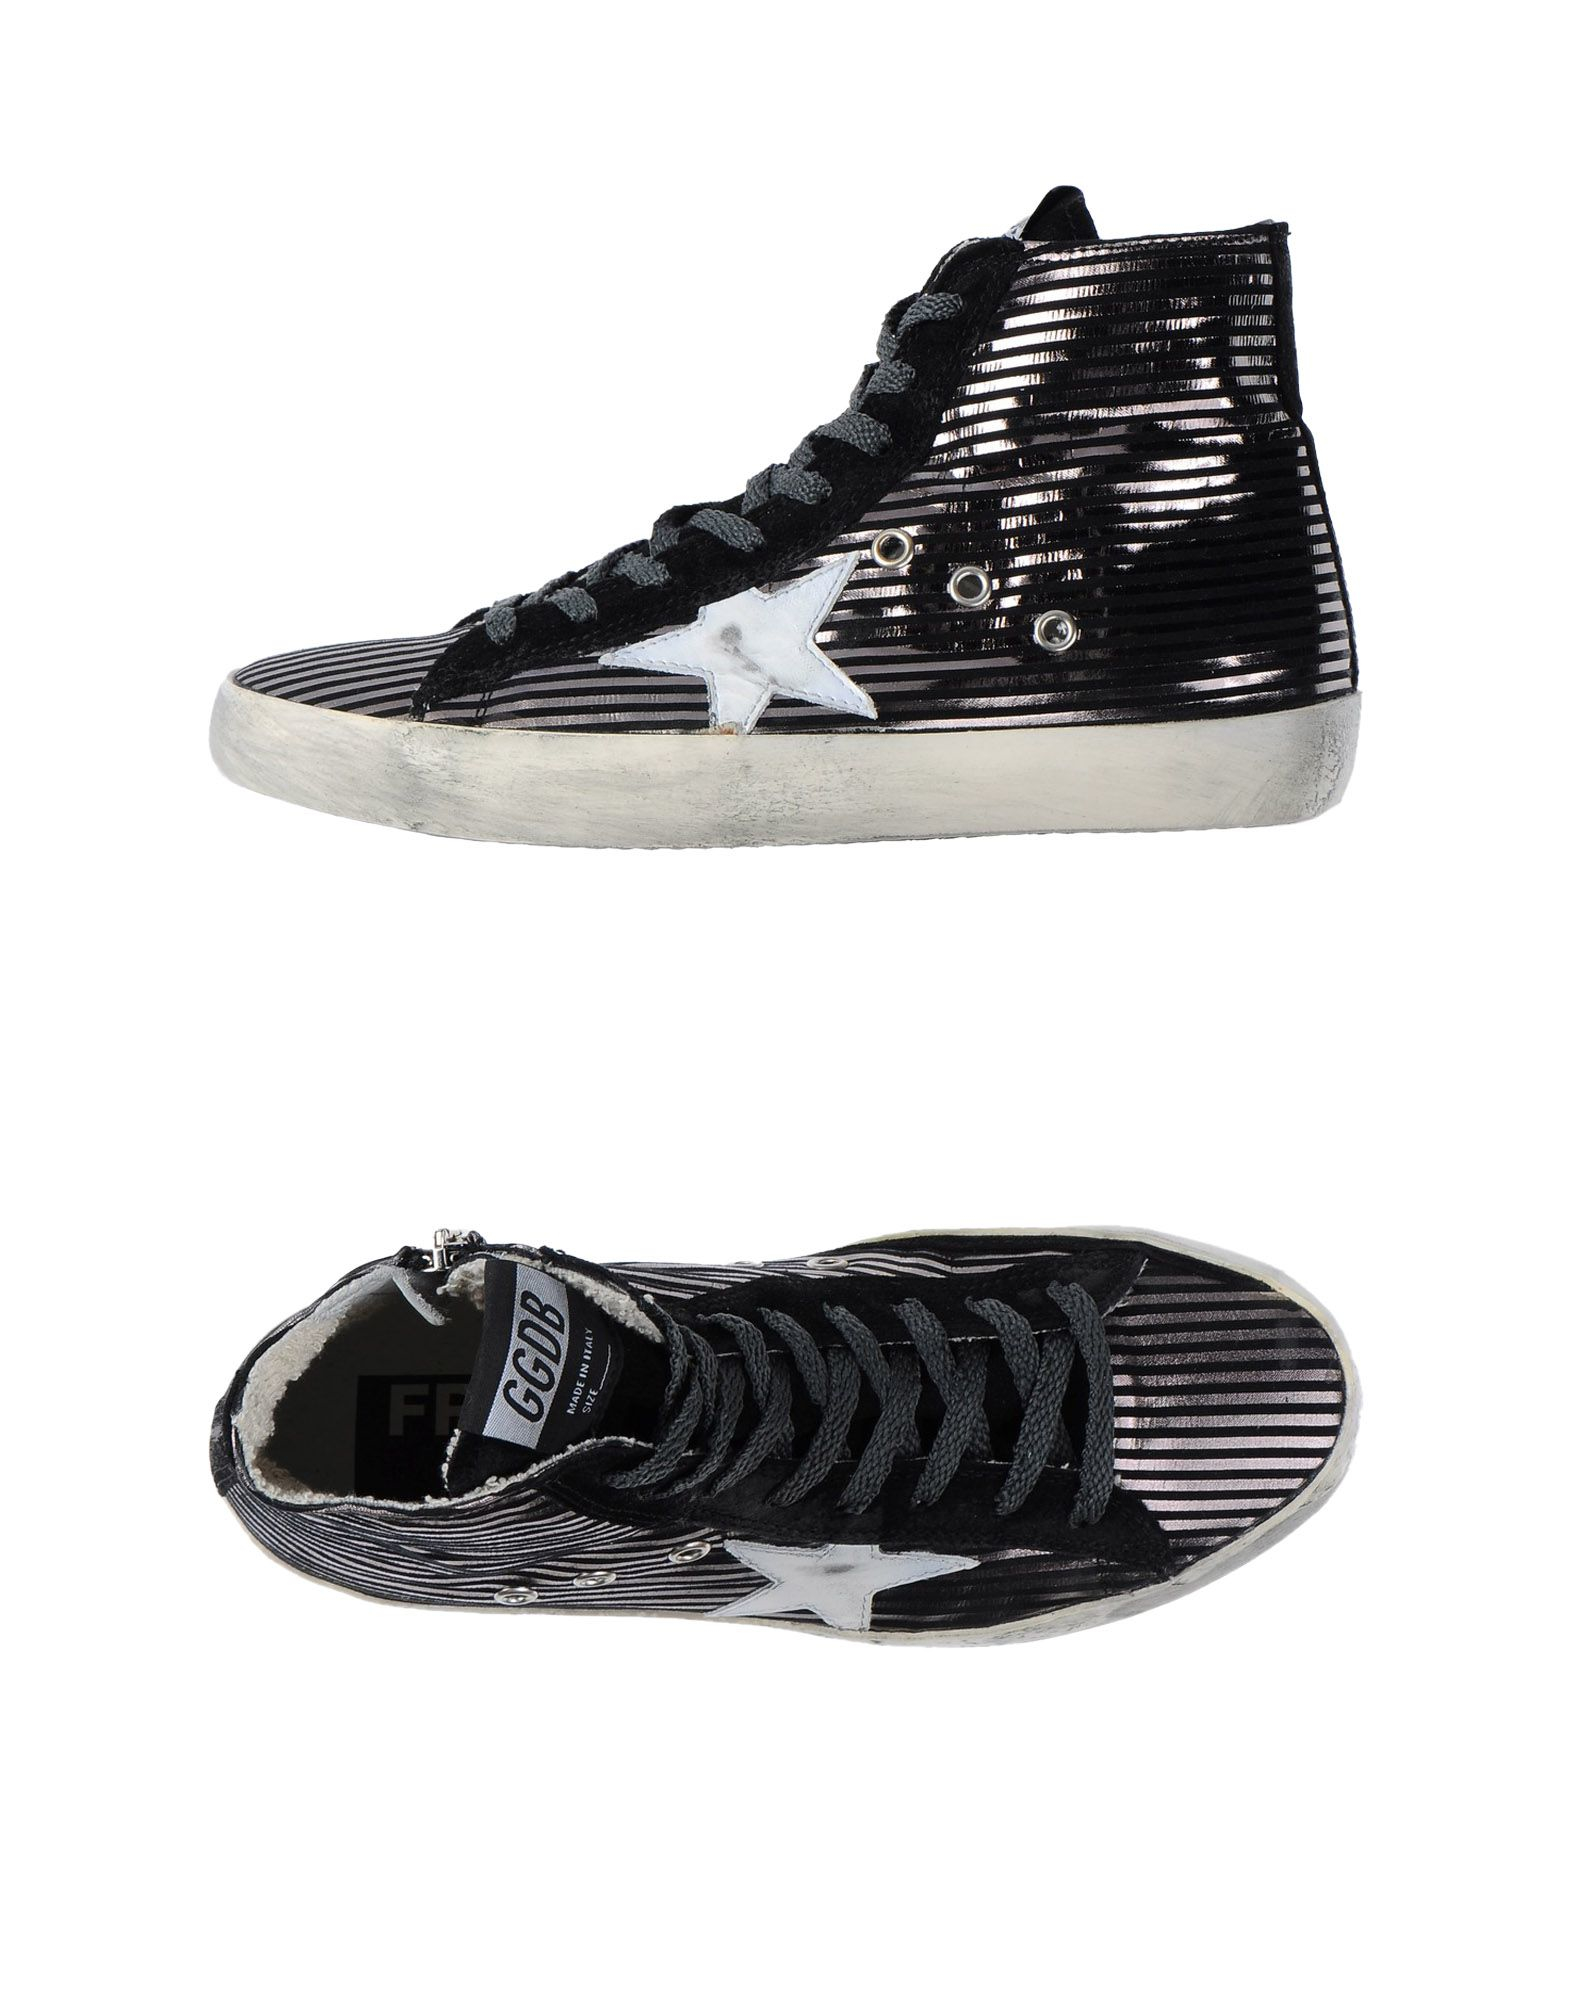 golden goose deluxe brand high top leather sneakers in black for men lyst. Black Bedroom Furniture Sets. Home Design Ideas